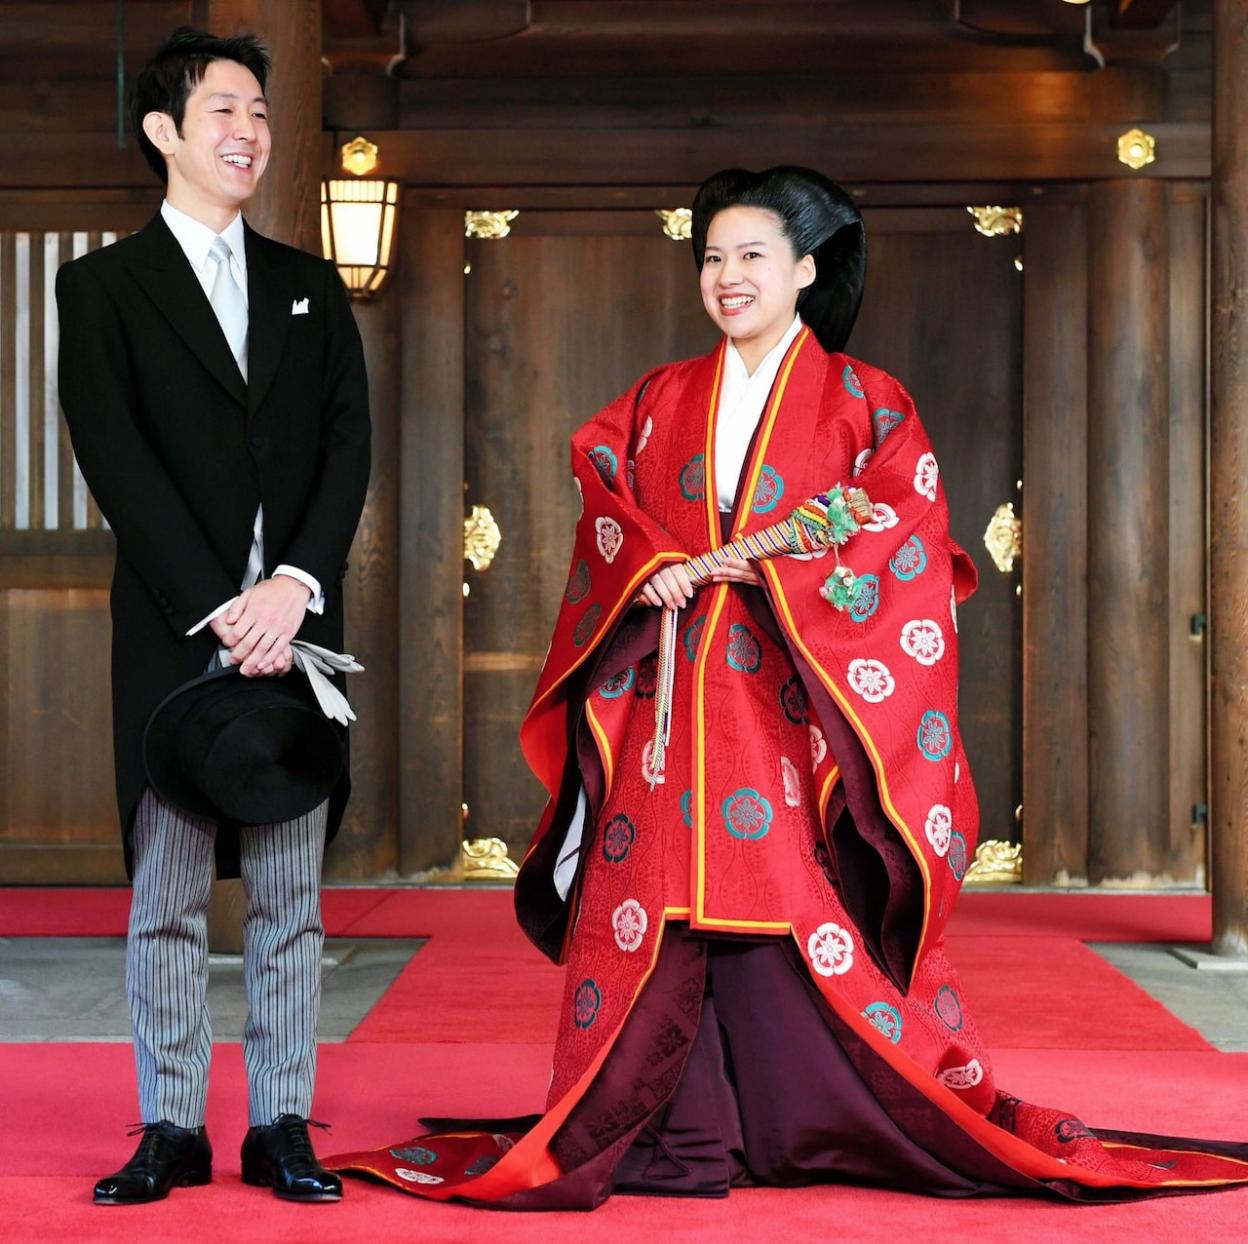 Japanese Princess Ayako clothed in ceremonial wedding attire (right) standing next to her groom Kei Moriya (left) at their wedding on Monday 29, October 2018. Credit:  THE ASAHI SHIMBUN